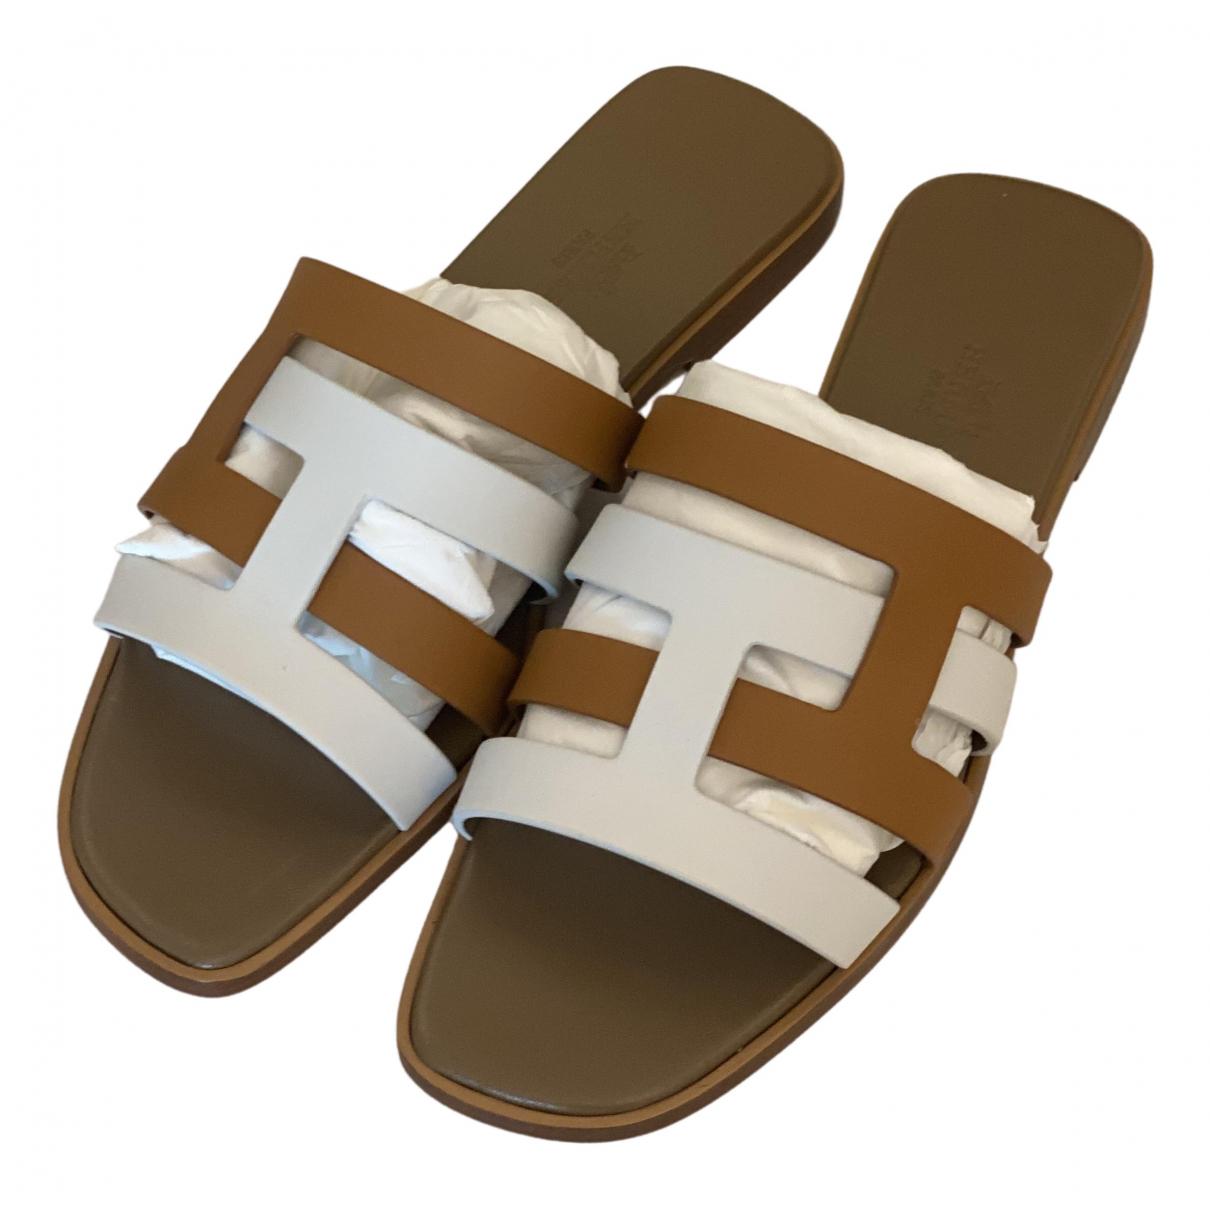 Hermès Oran White Leather Sandals for Women 37.5 EU